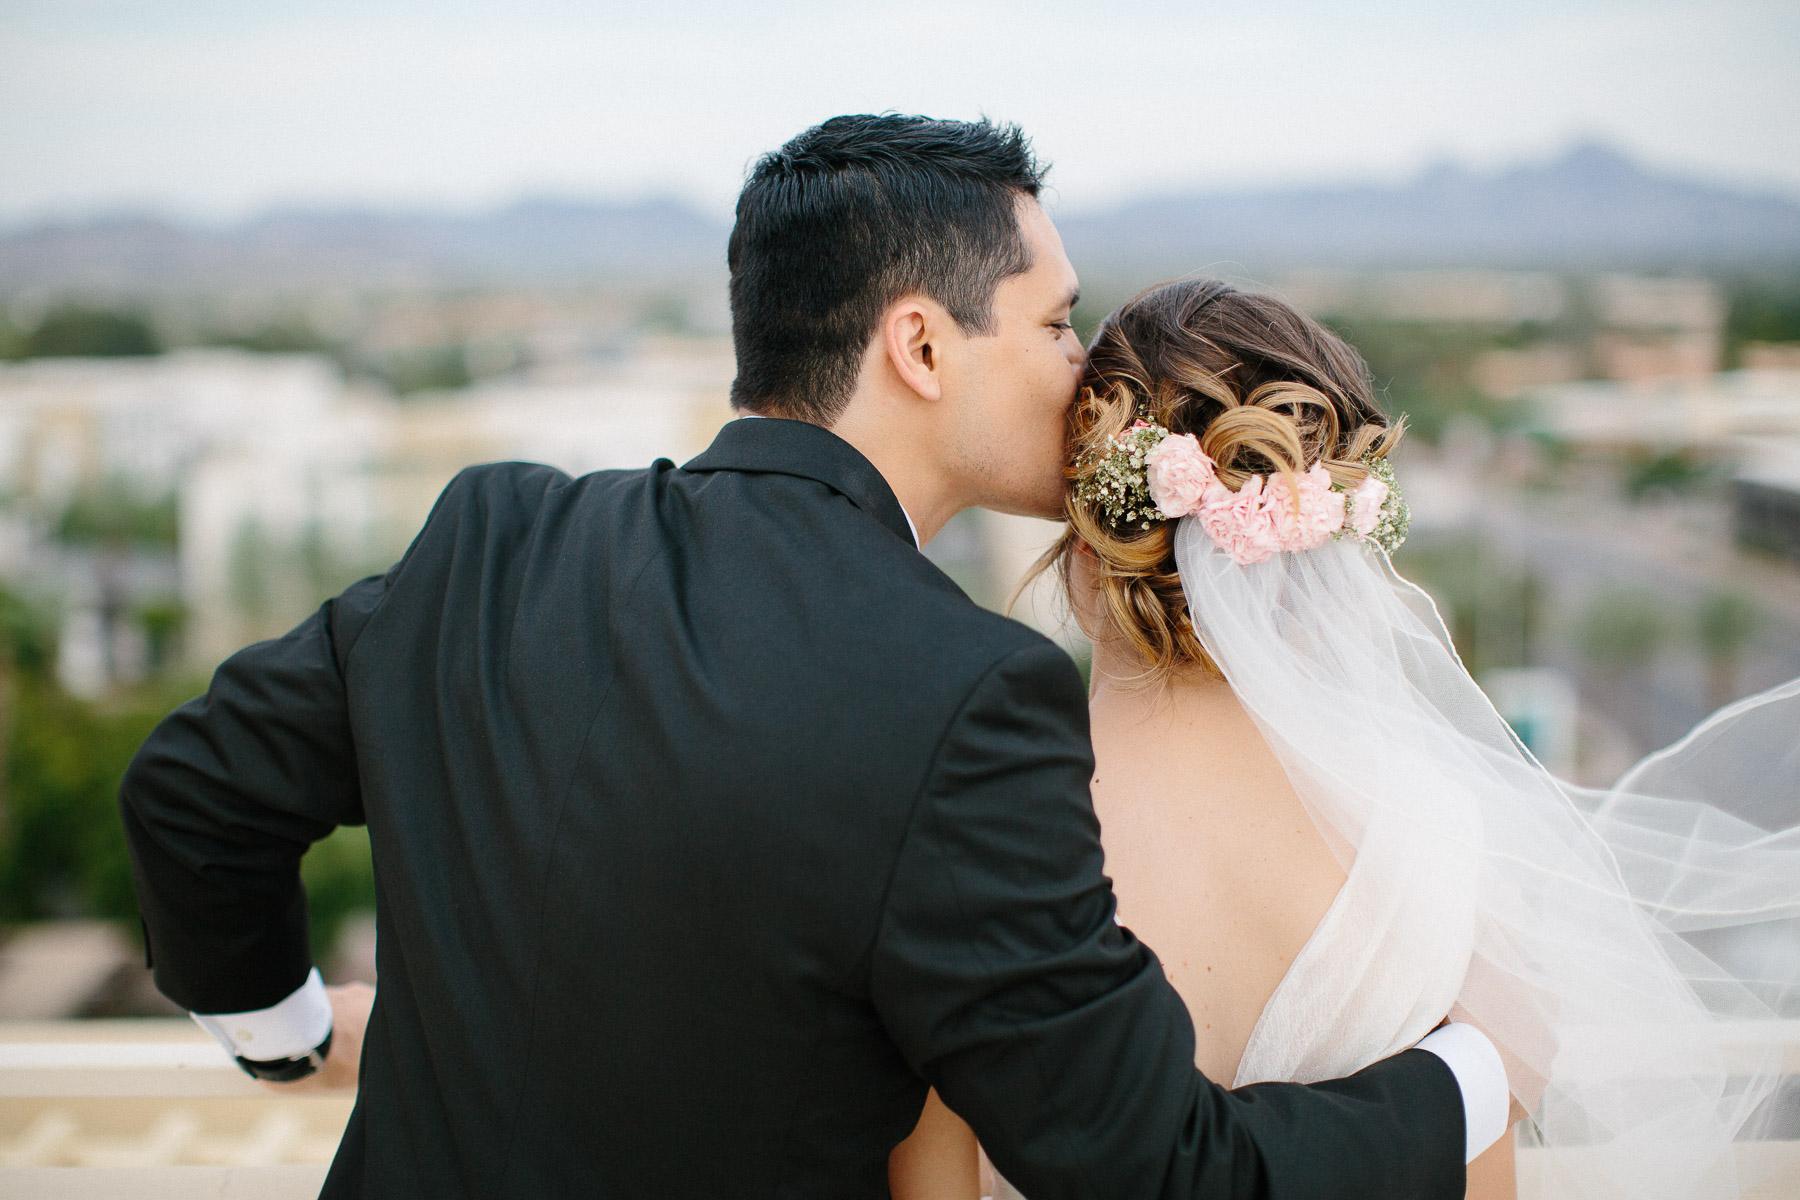 170708-Luxium-Weddings-Arizona-Keono-Lucy-Sheraton-Crescent-webres-2258.jpg